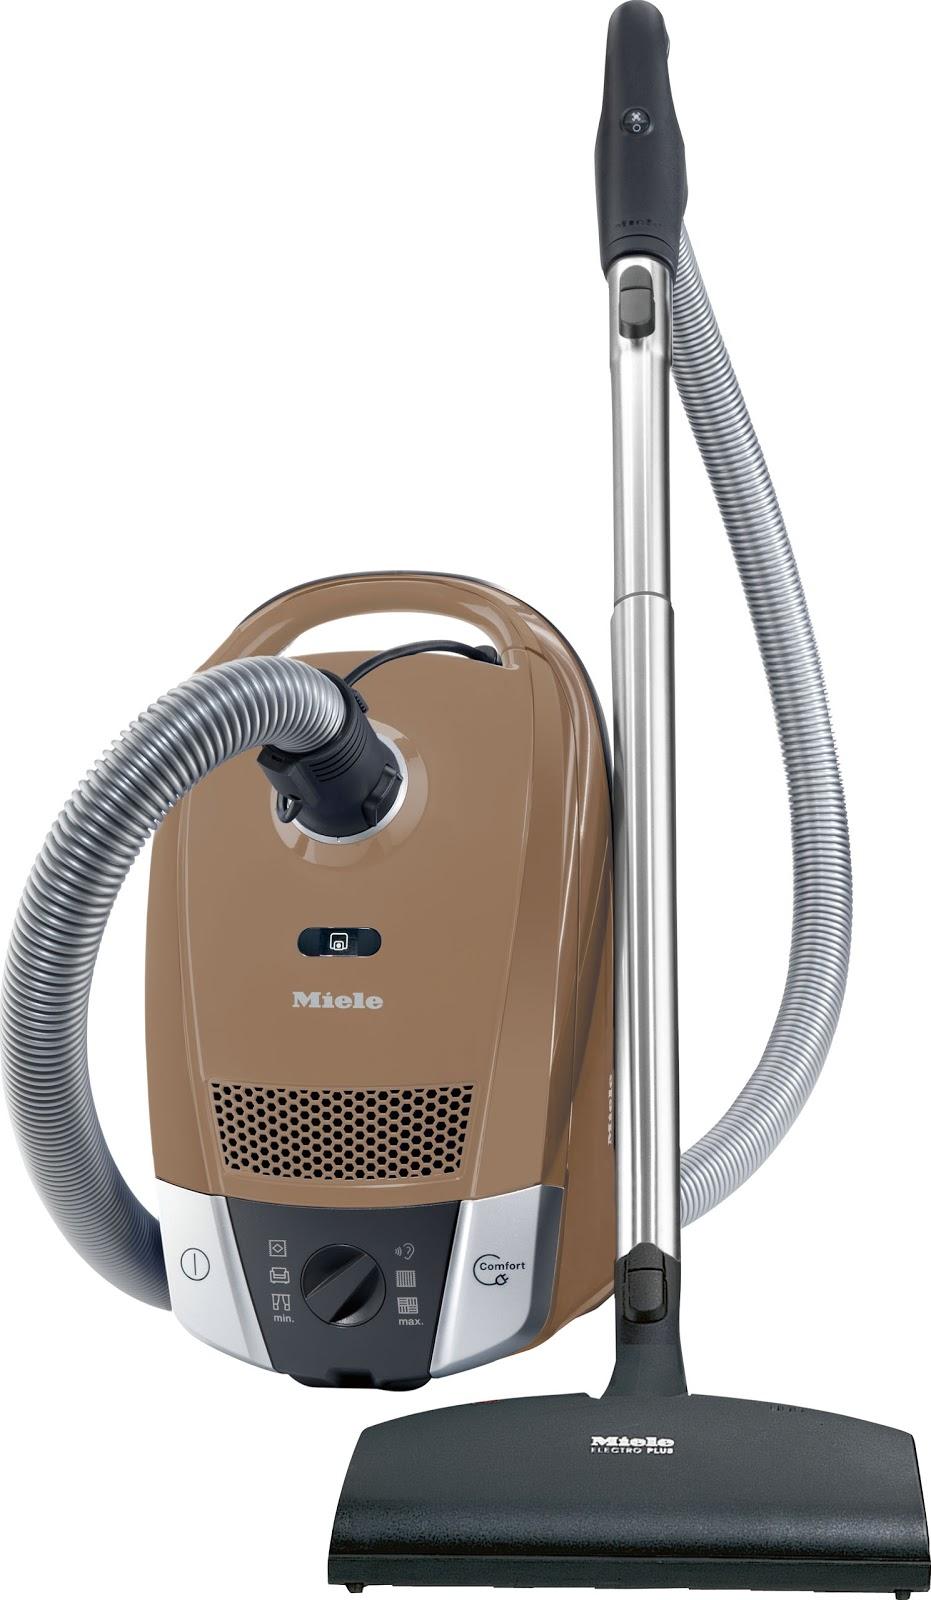 jju0027s green u0026 natural cleaning at vacshackcom miele s6 canister vacuum cleaner